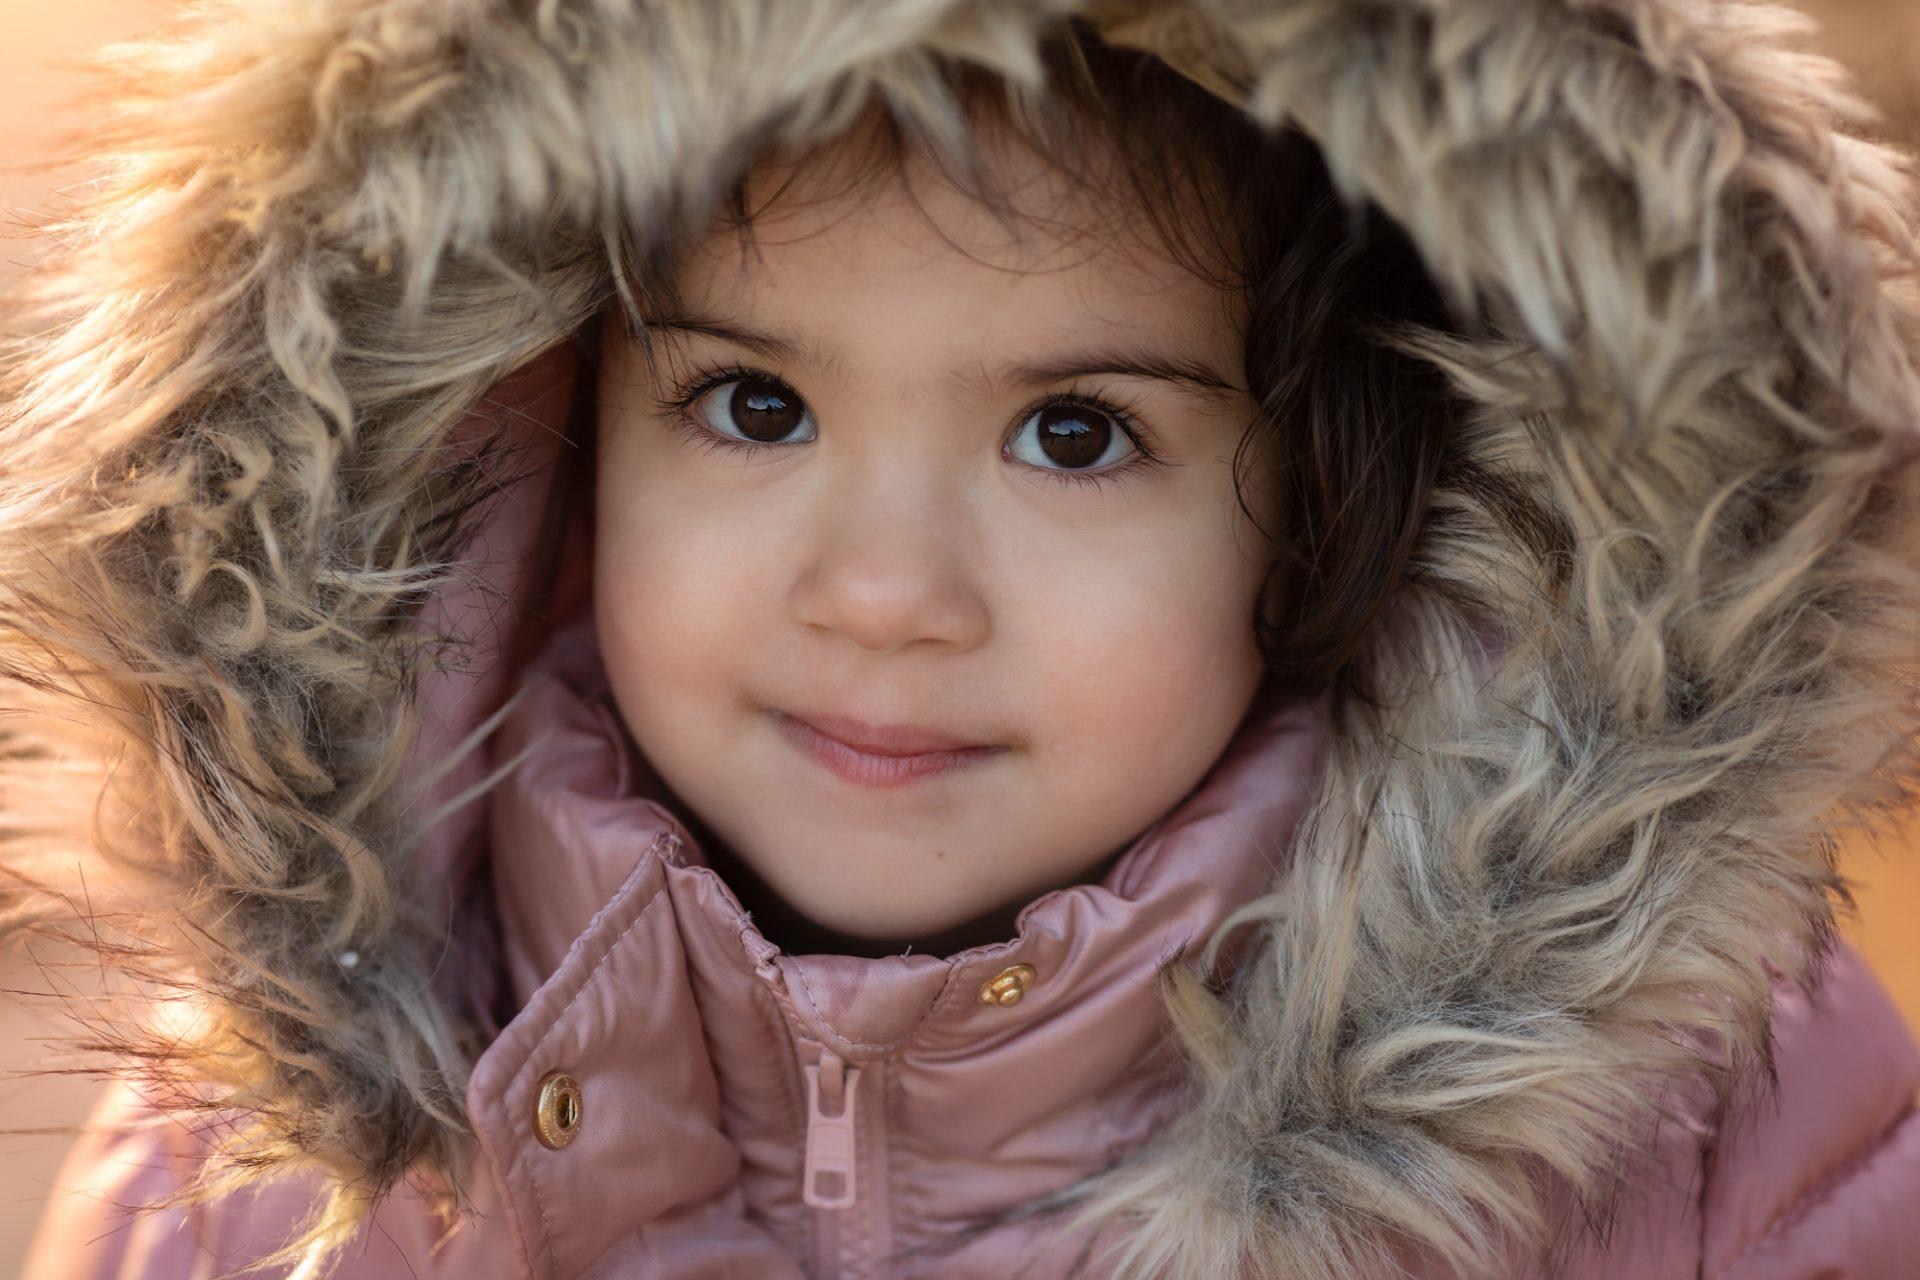 fotograaf kinderen kinderfotograaf fotoshoot winter Veluwe Lelystad